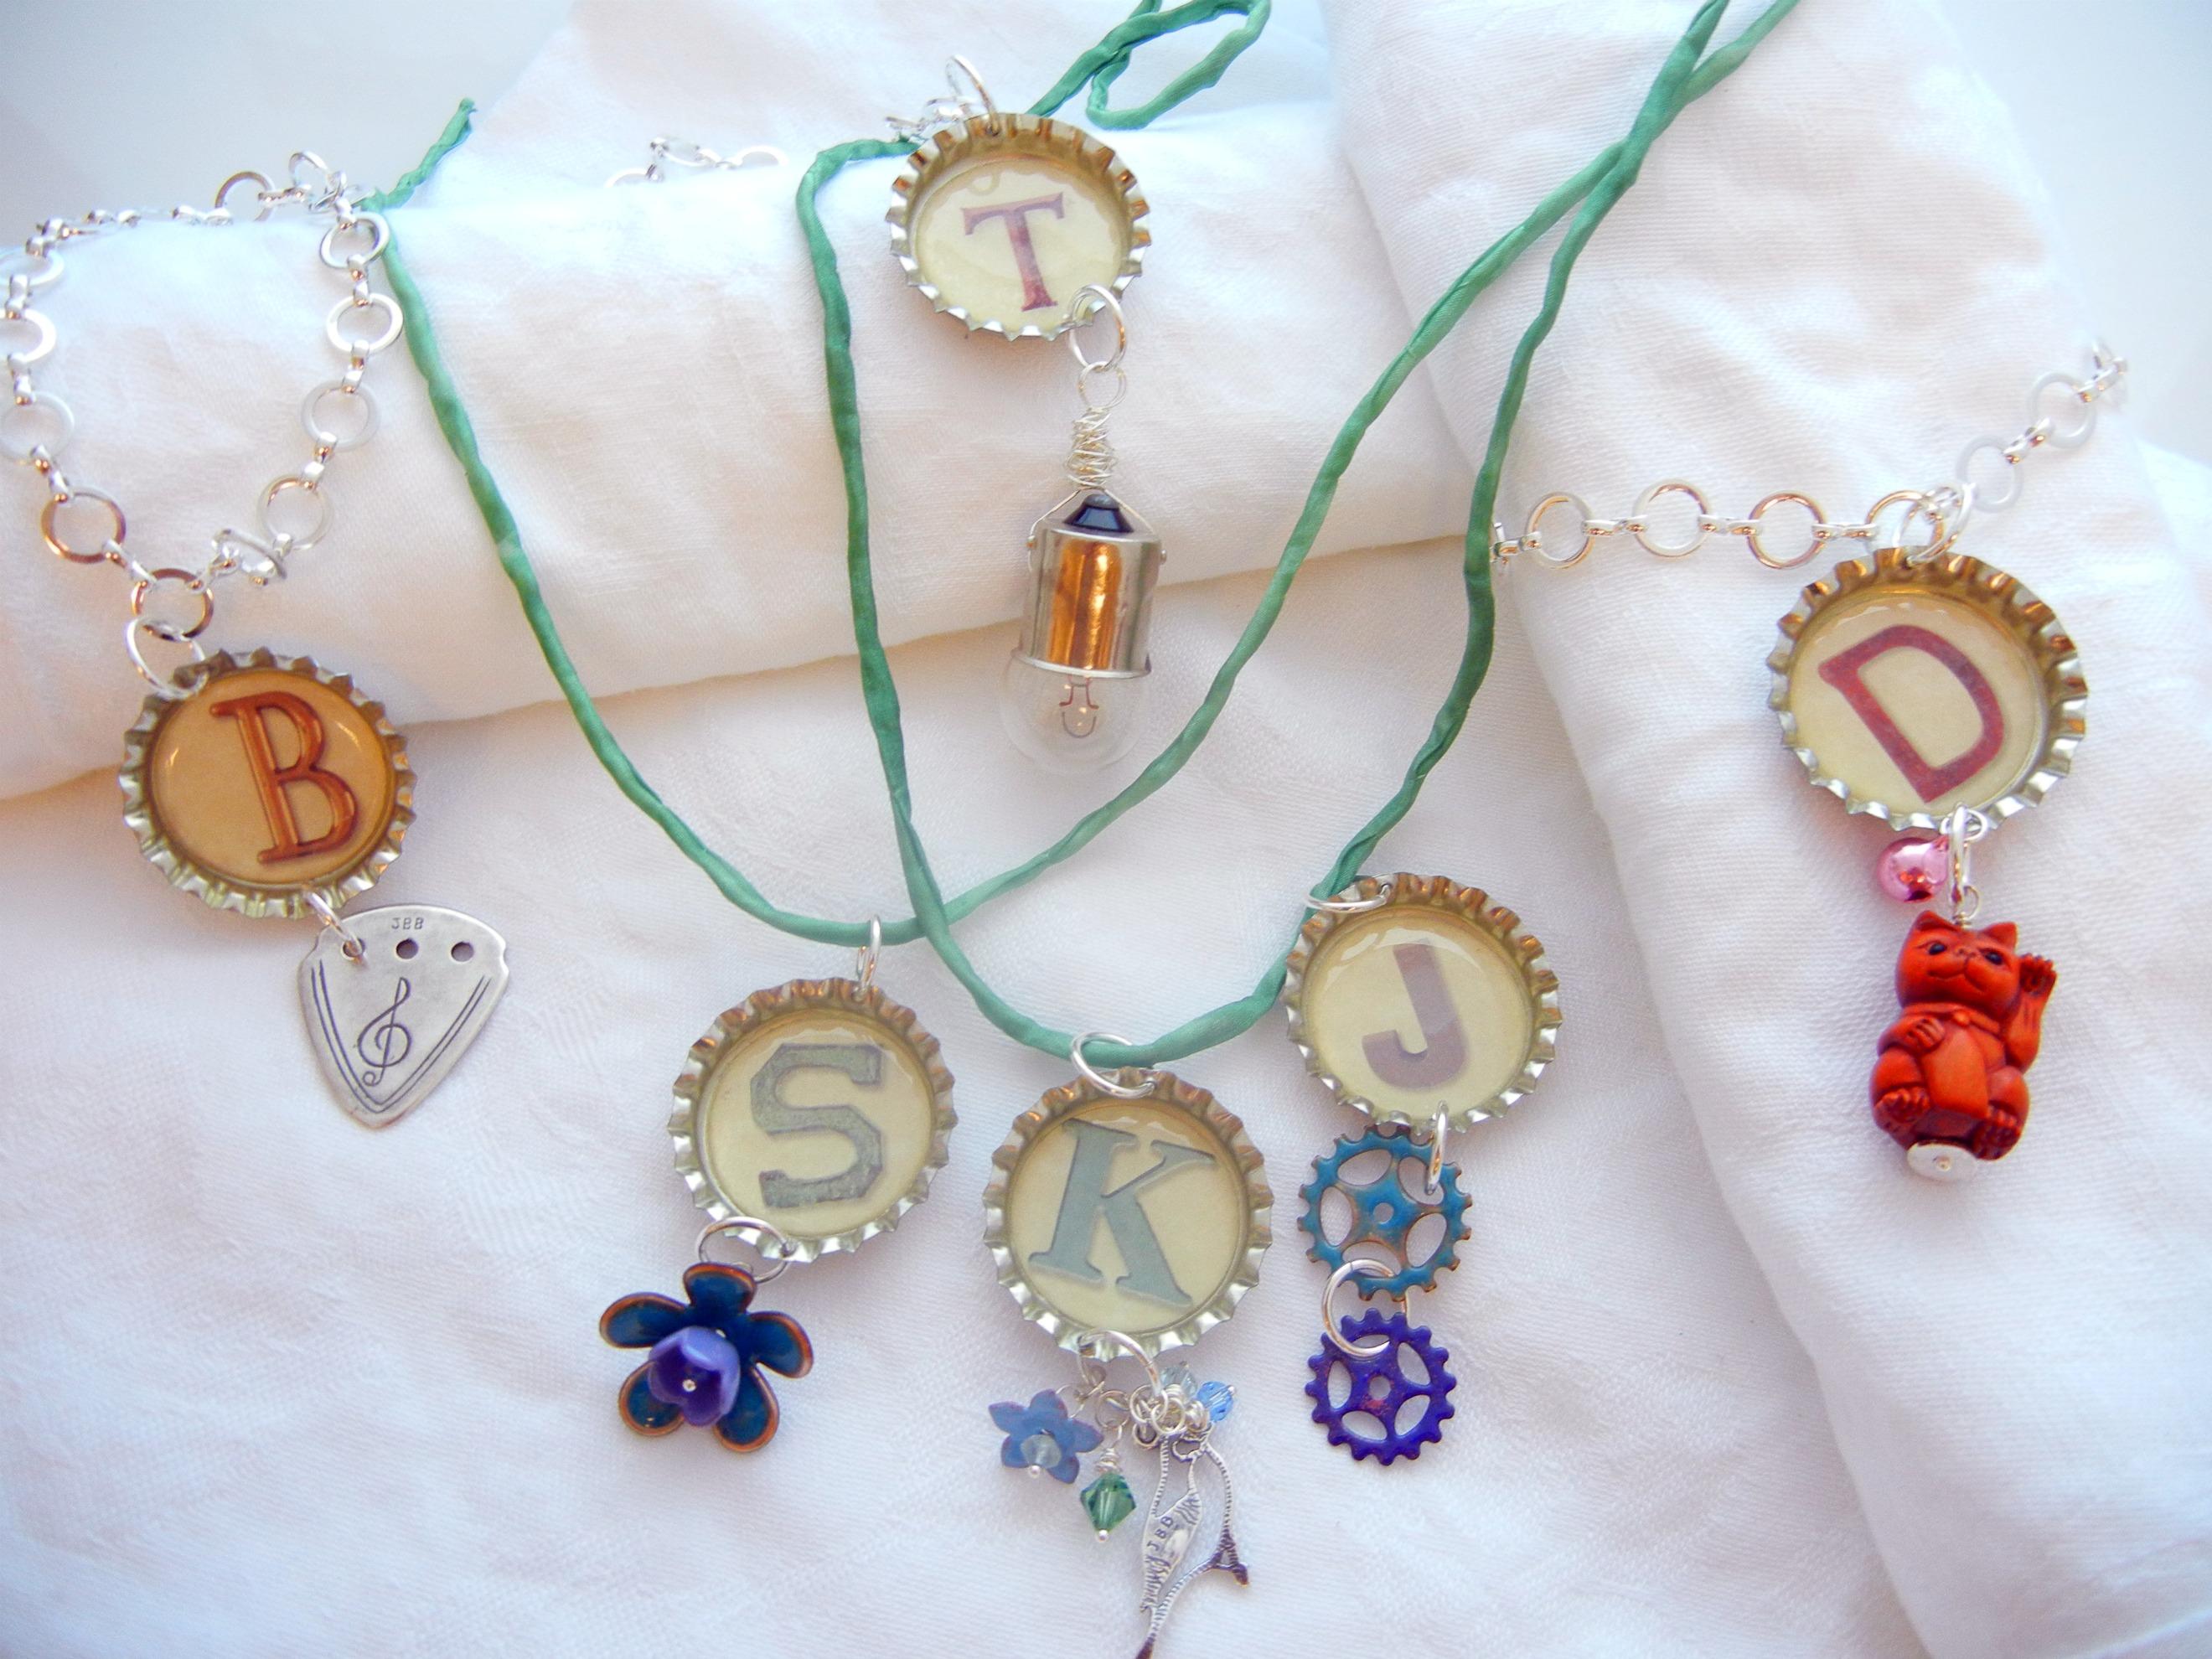 Twelve Days Of Christmas Jewelry Designs 2 Bottle Cap